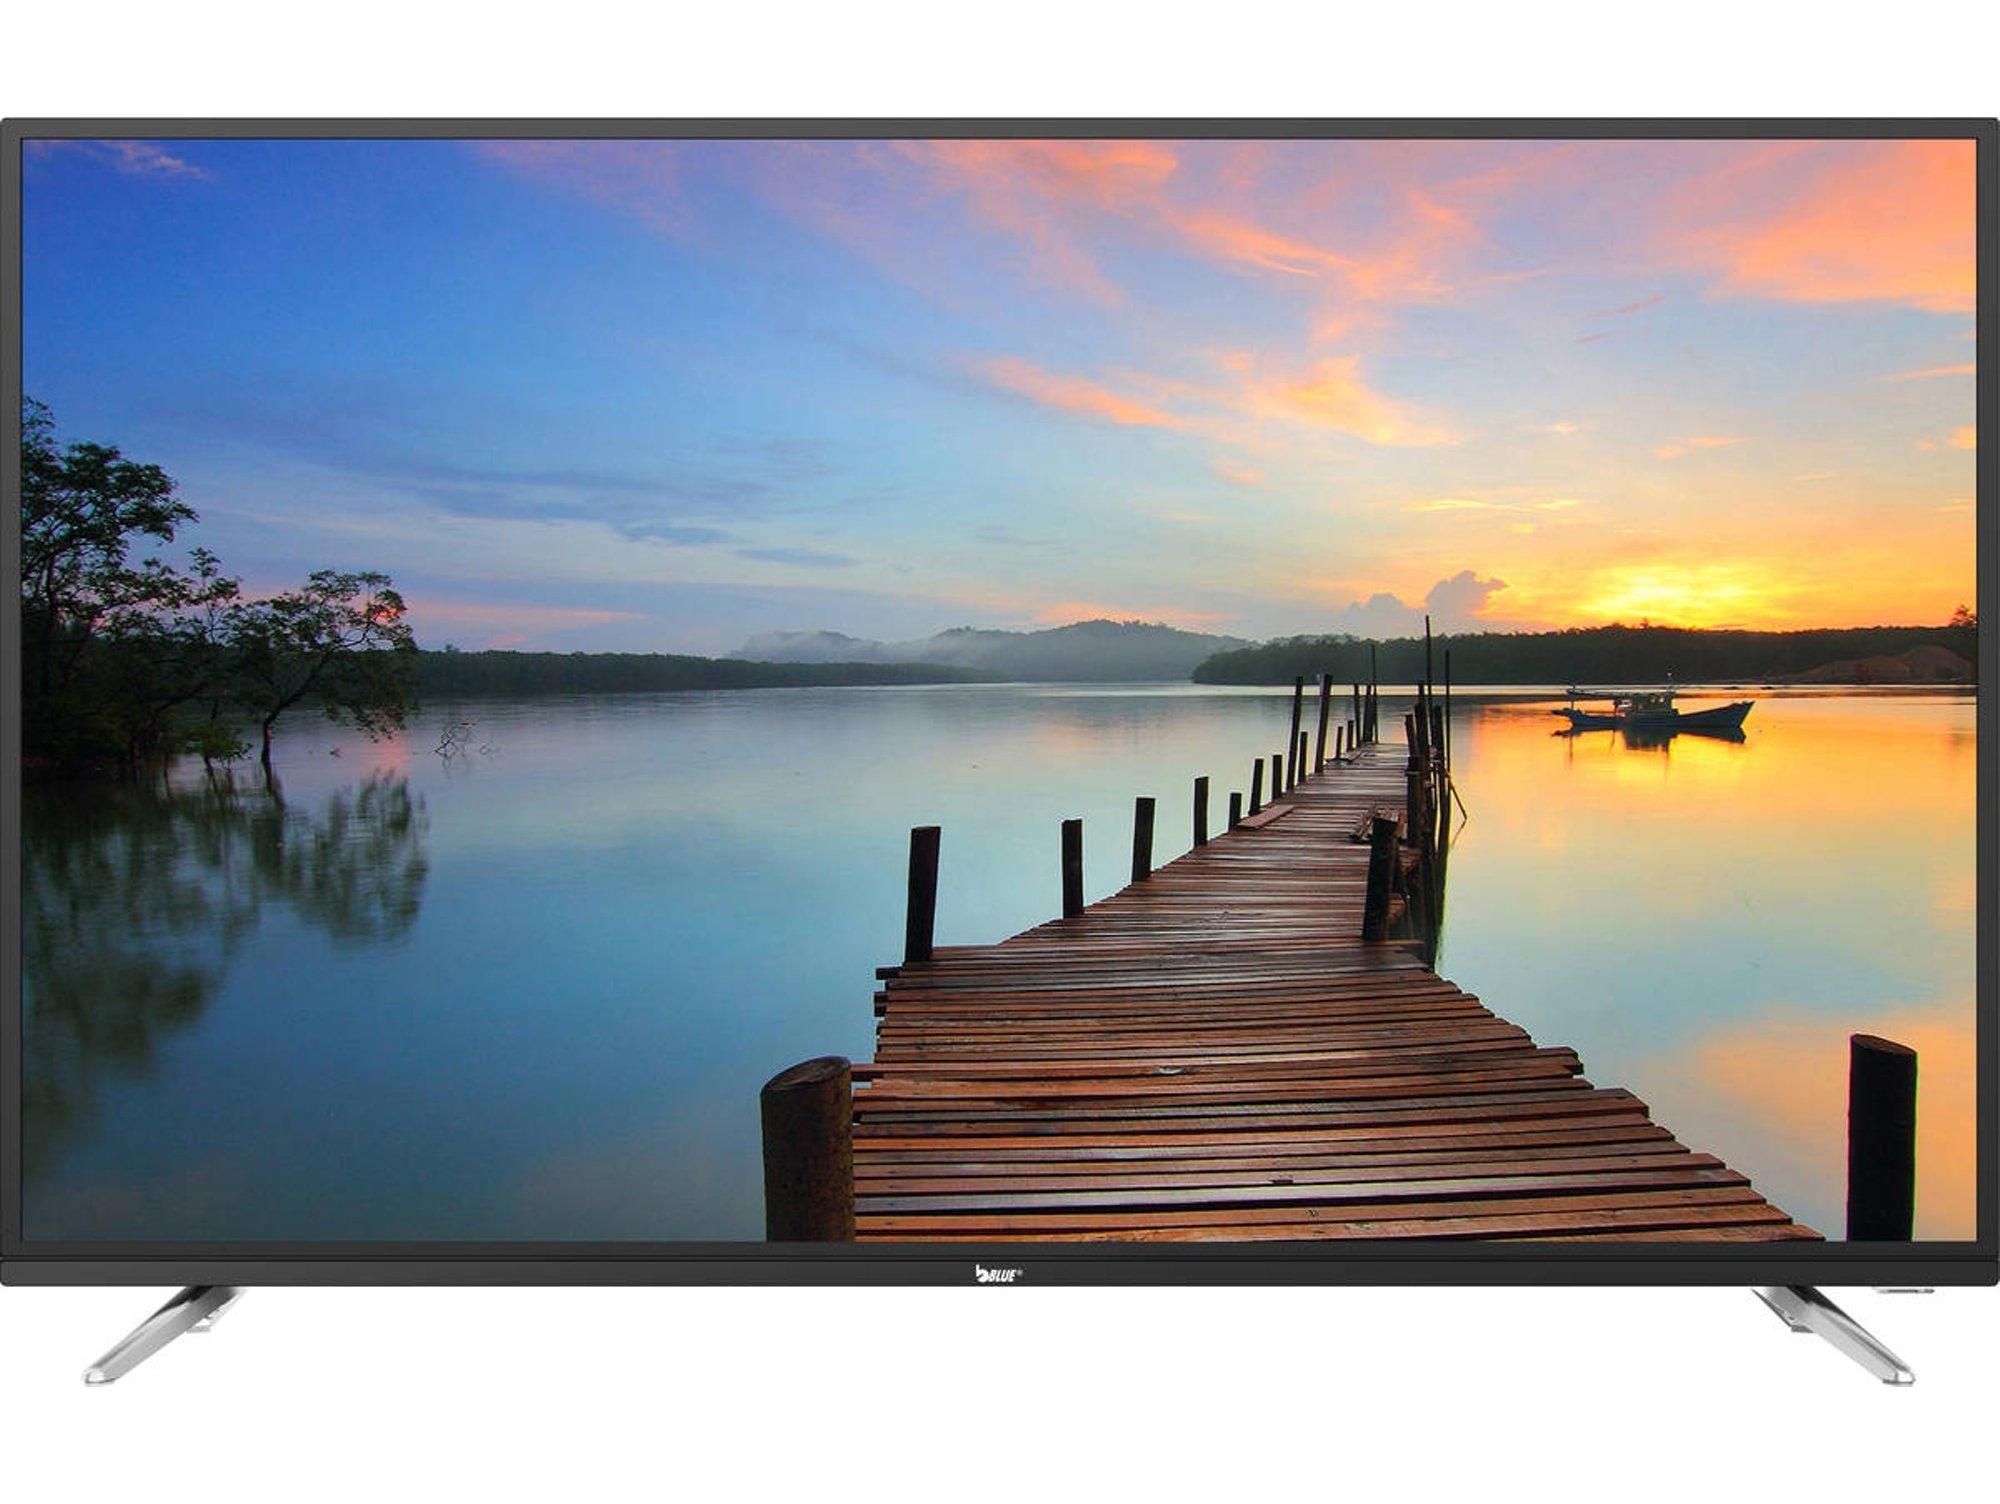 TV BLUE 43BL700 (43'' - 109 cm - Full HD - Smart TV)